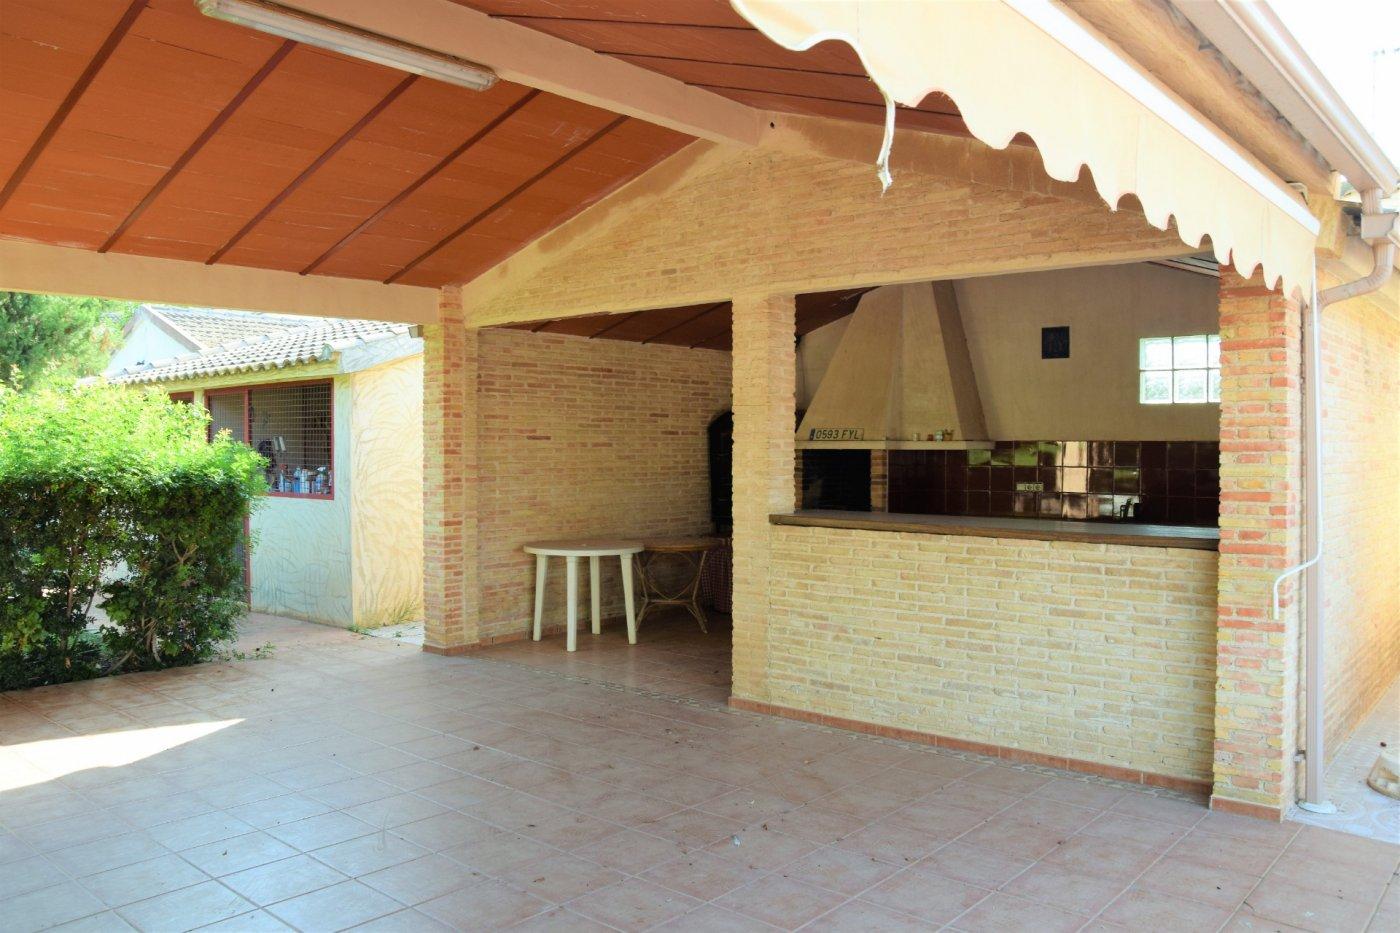 Chalet en Murcia www.joaquincarceles.com JC174 (49)